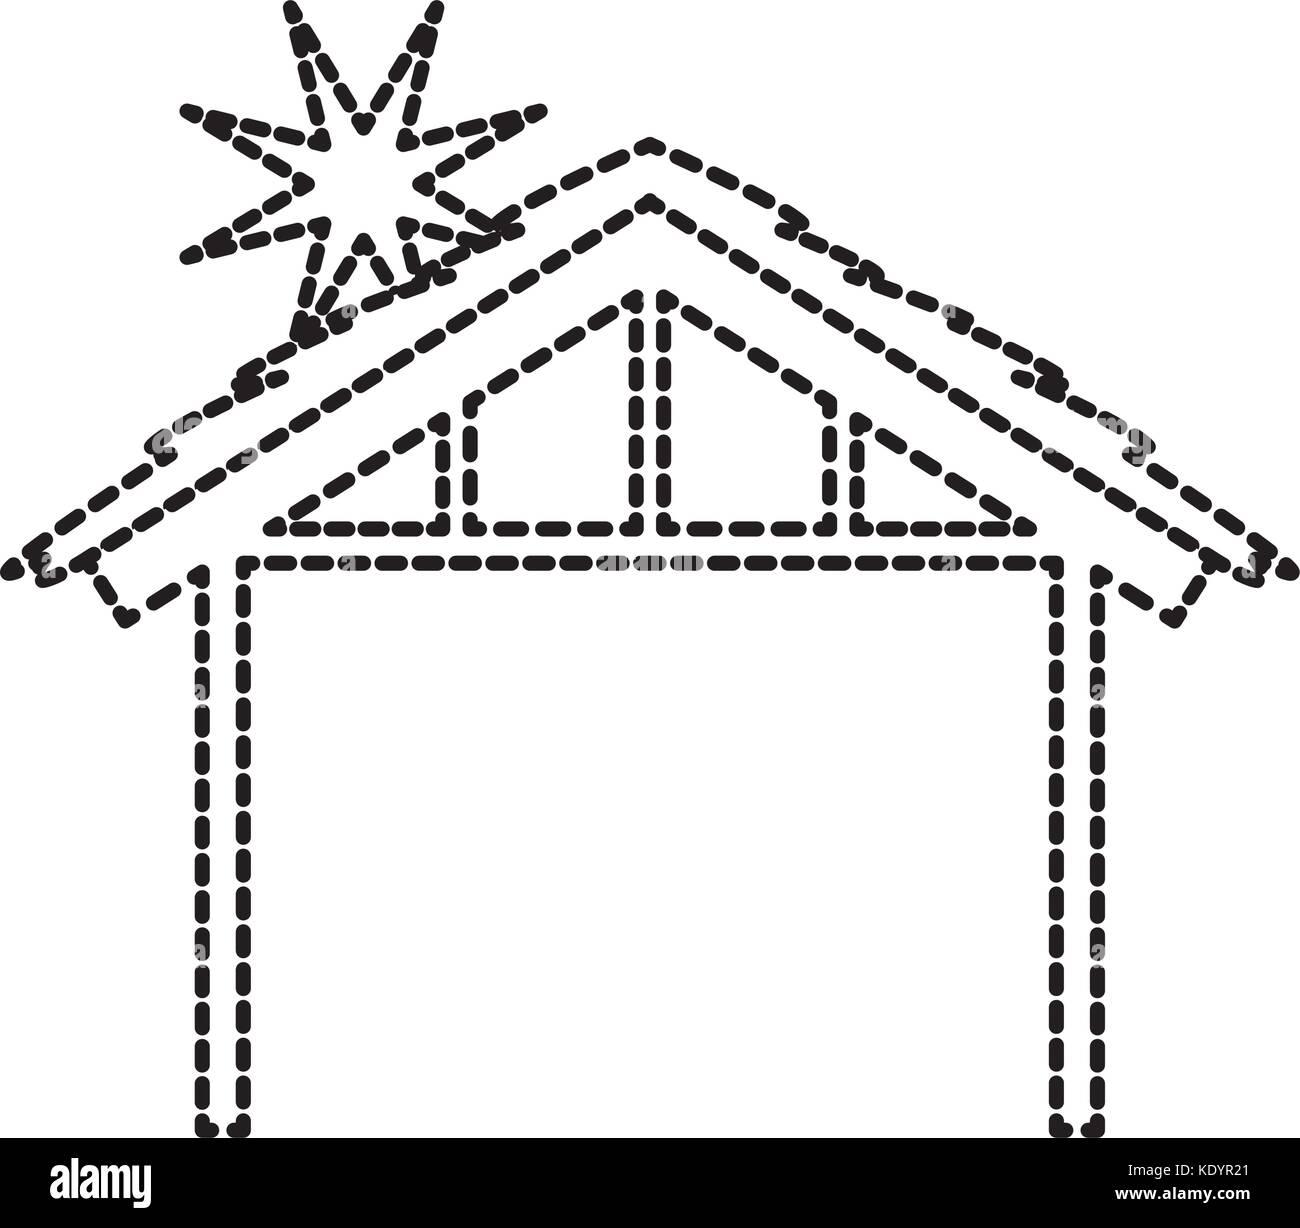 hight resolution of wooden hut house manger design image stock image